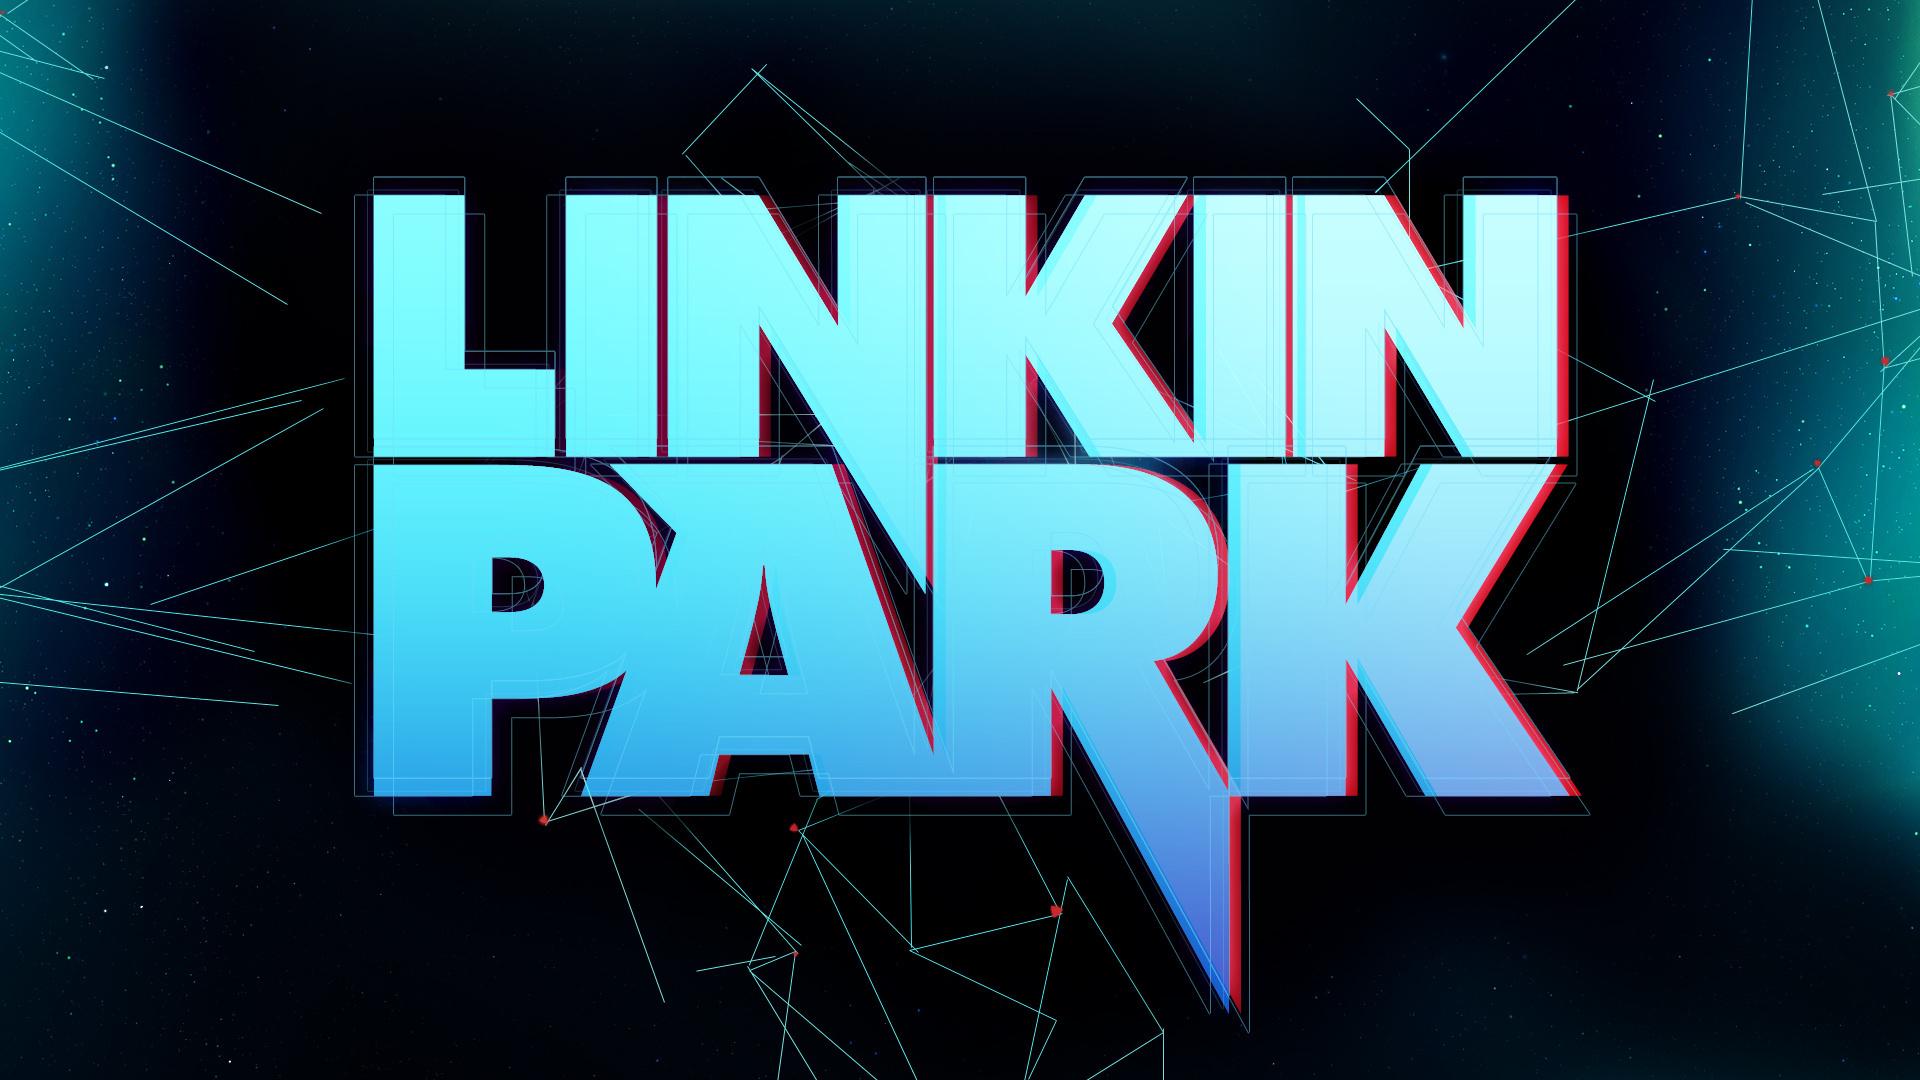 linkin park logo 1080p hd wallpaper 1920x1080